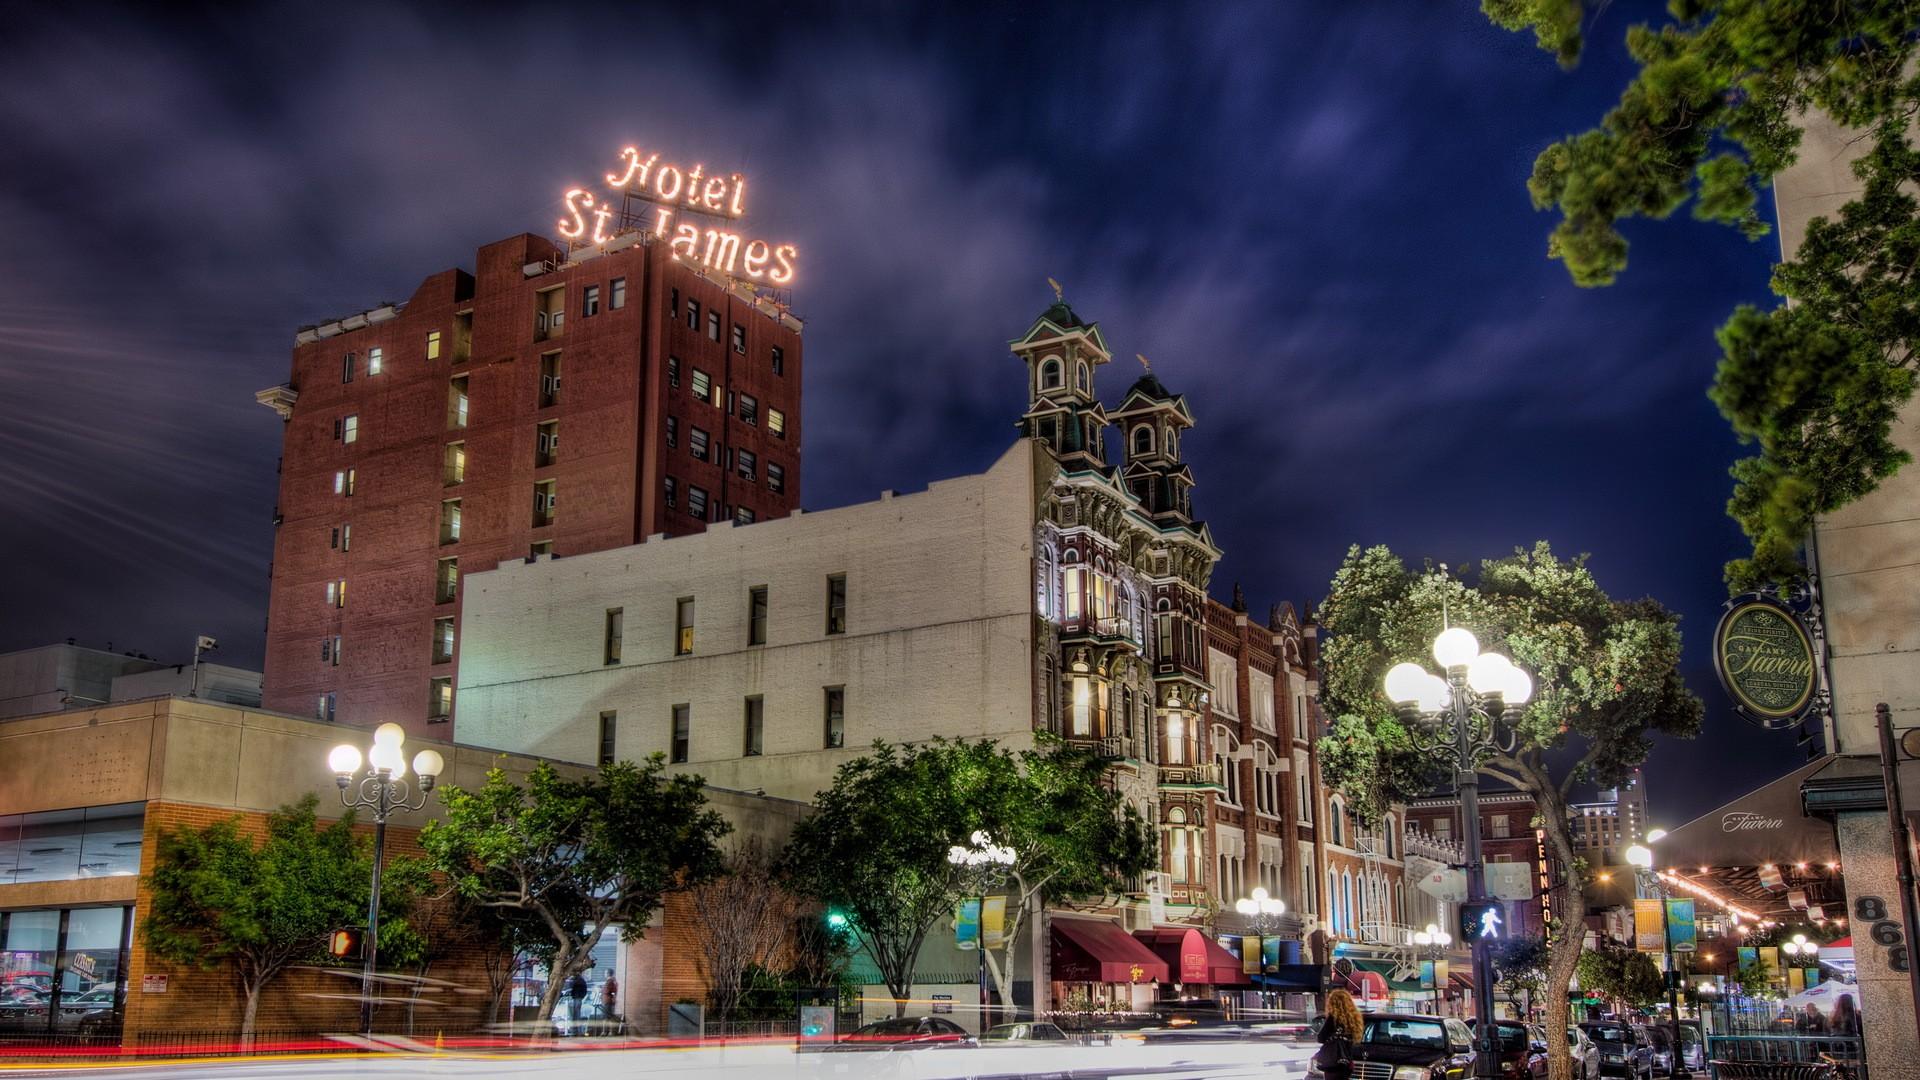 other-hotel-st-james-san-diego-california-street-stree-cafes-lights-city-image.jpg